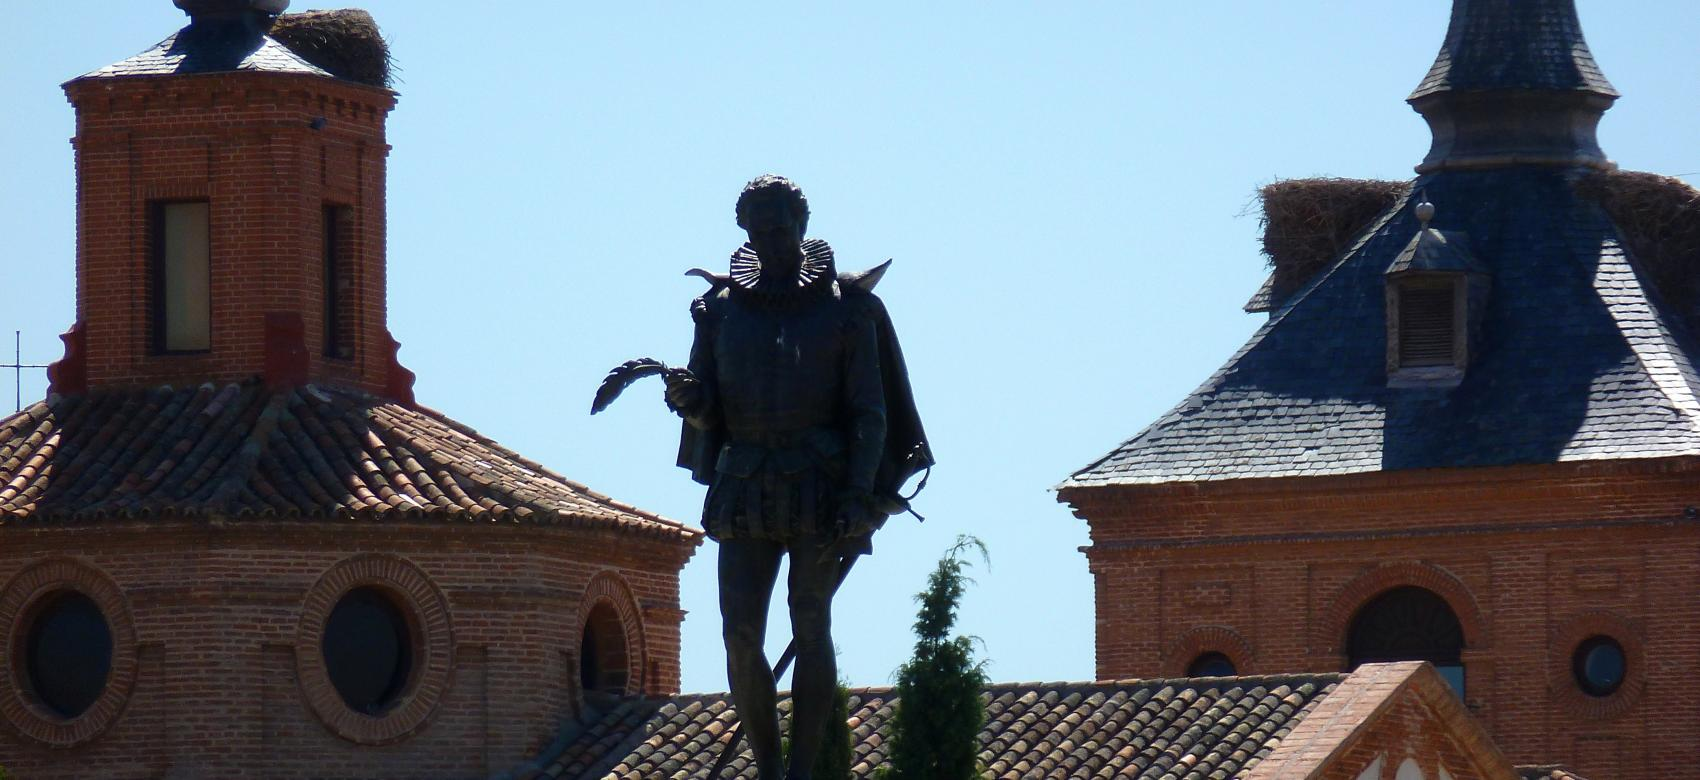 Estatua de Cervantes. Alcalá de Henares